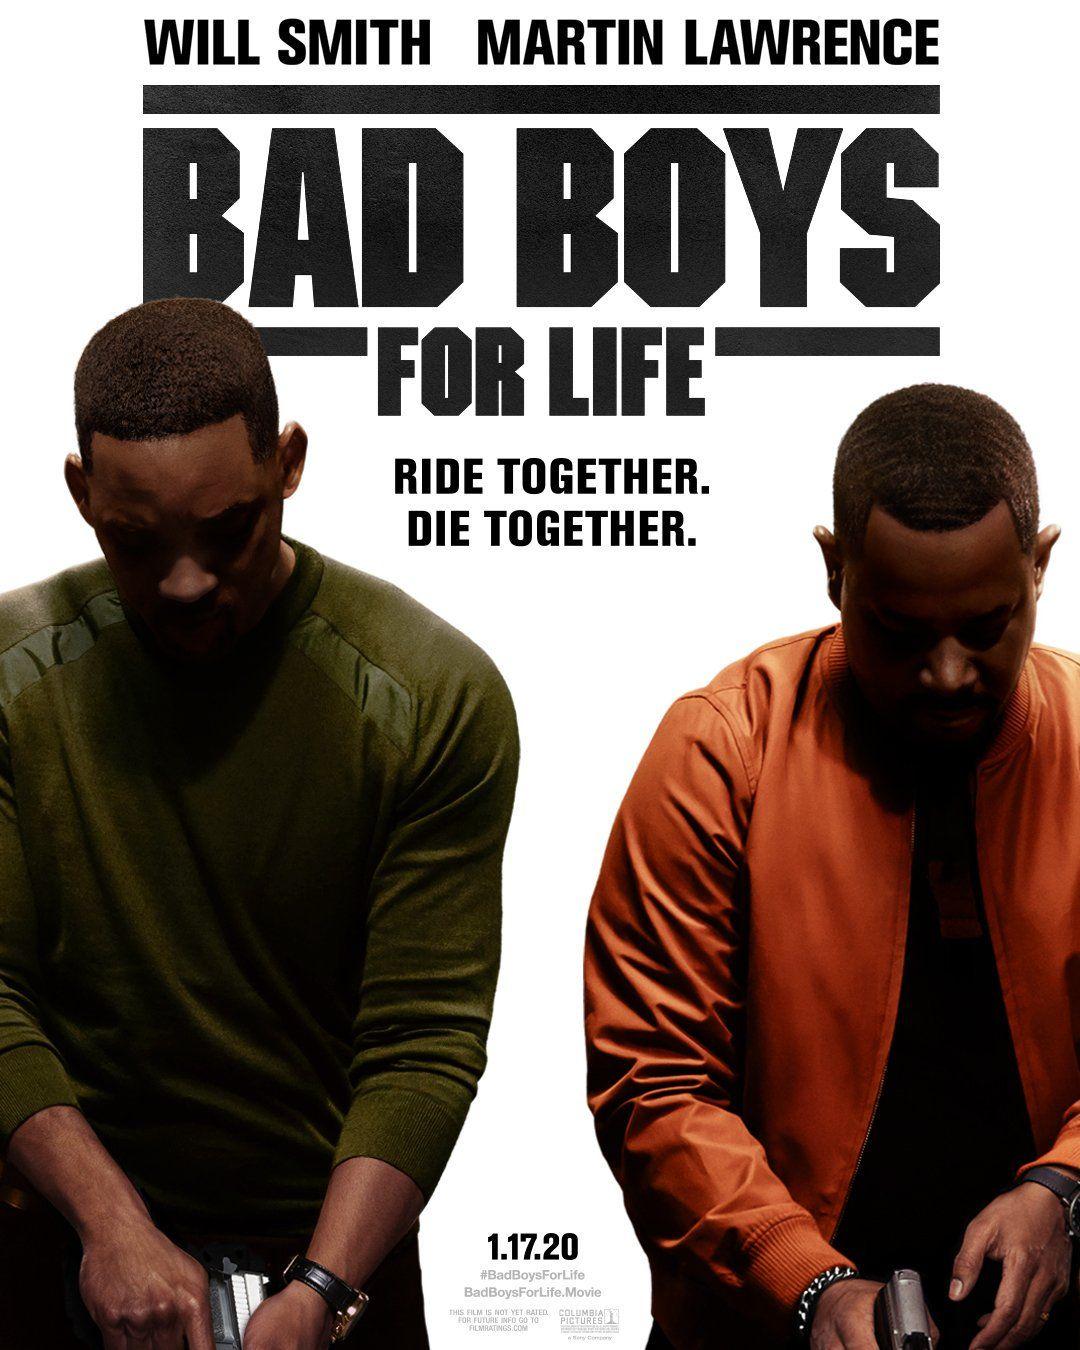 Bad Boys For Life Movie Poster Https Teaser Trailer Com Movie Bad Boys 3 Action Comedy Movie Sequel Starring Wil Bad Boys Movie Movies For Boys Bad Boys